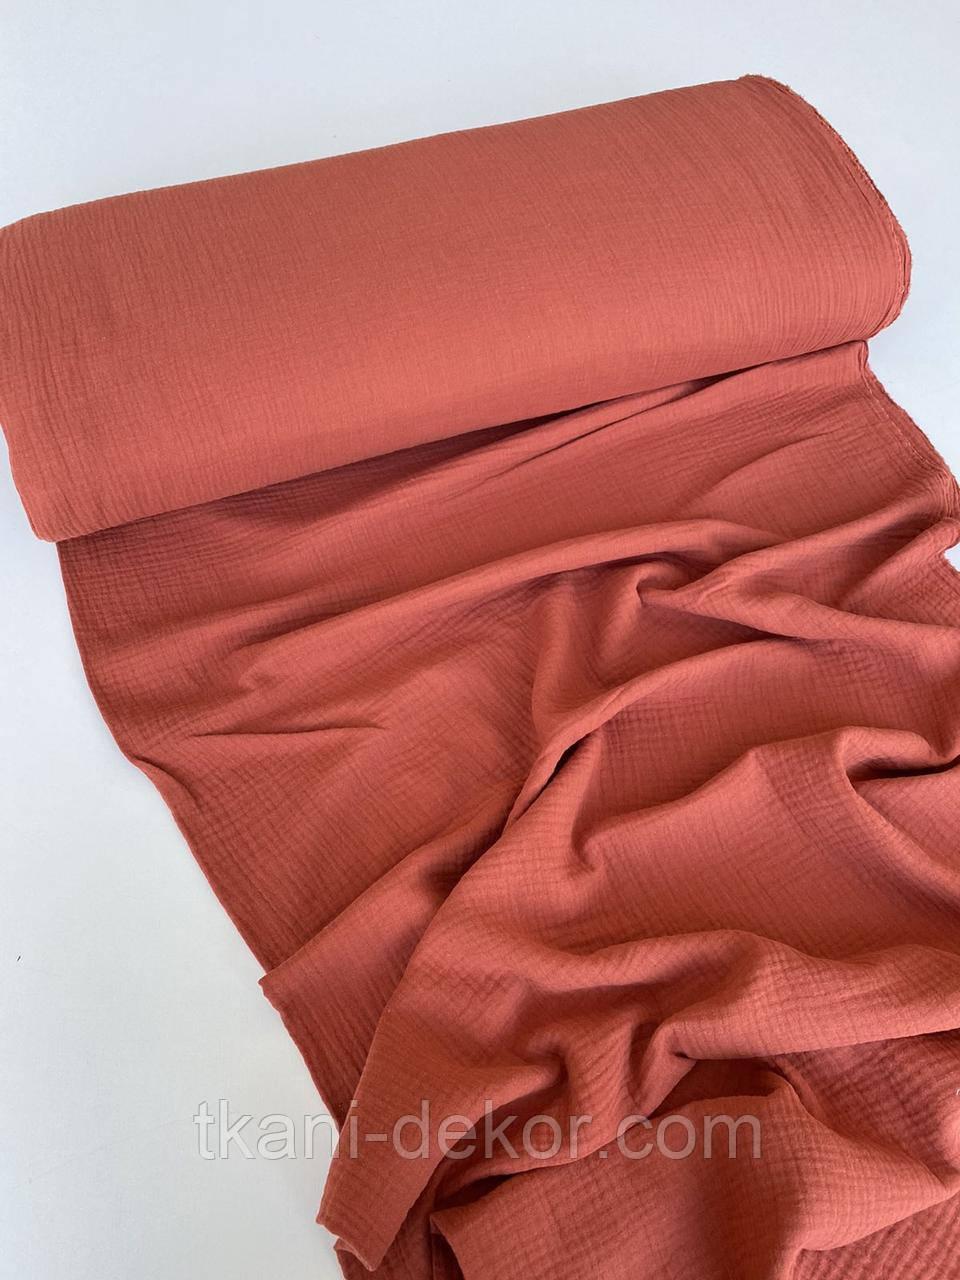 Муслин (хлопковая ткань) жатка кирпич однотон